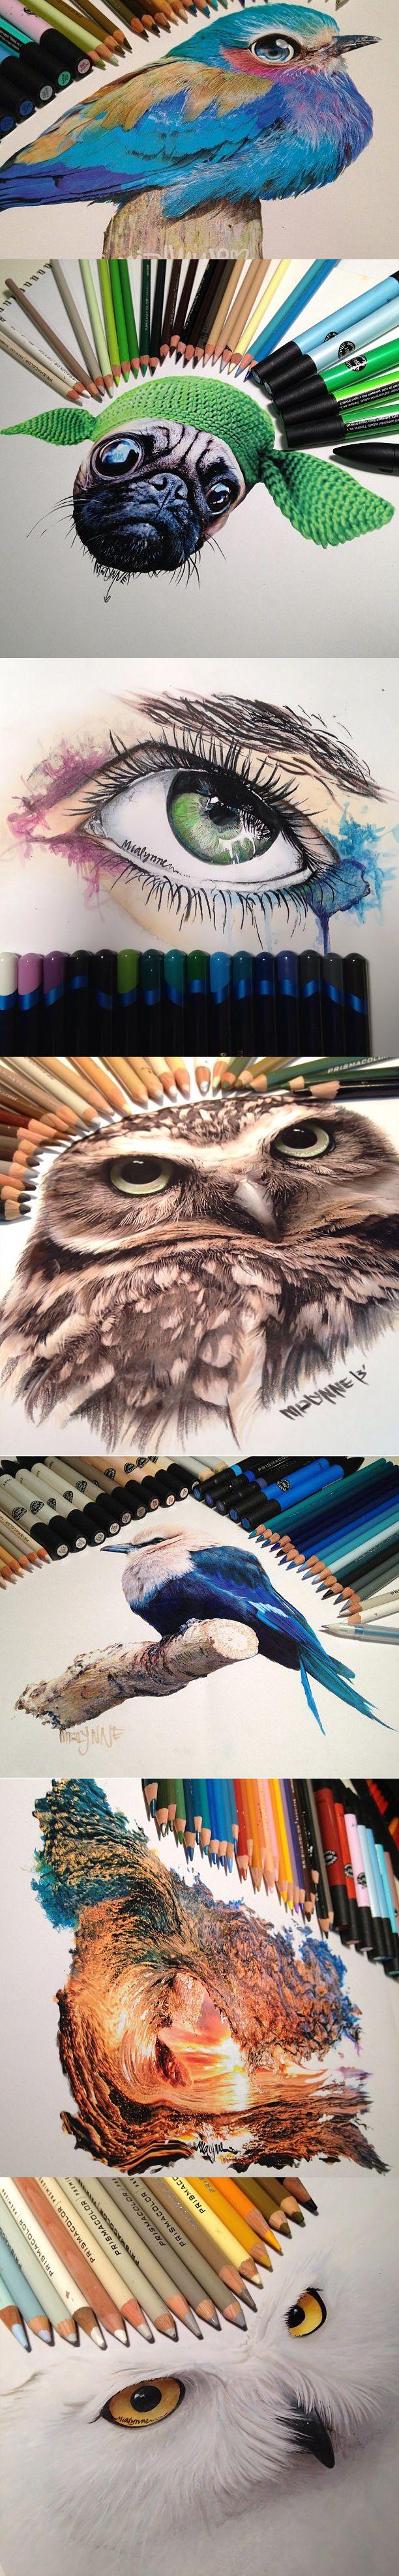 Hyperrealism with crayons, markers and ink. Se complete post: http://sala7design.com.br/2015/01/hiper-realismo-com-lapis-de-cor-marcadores-e-tinta-acrilica.html